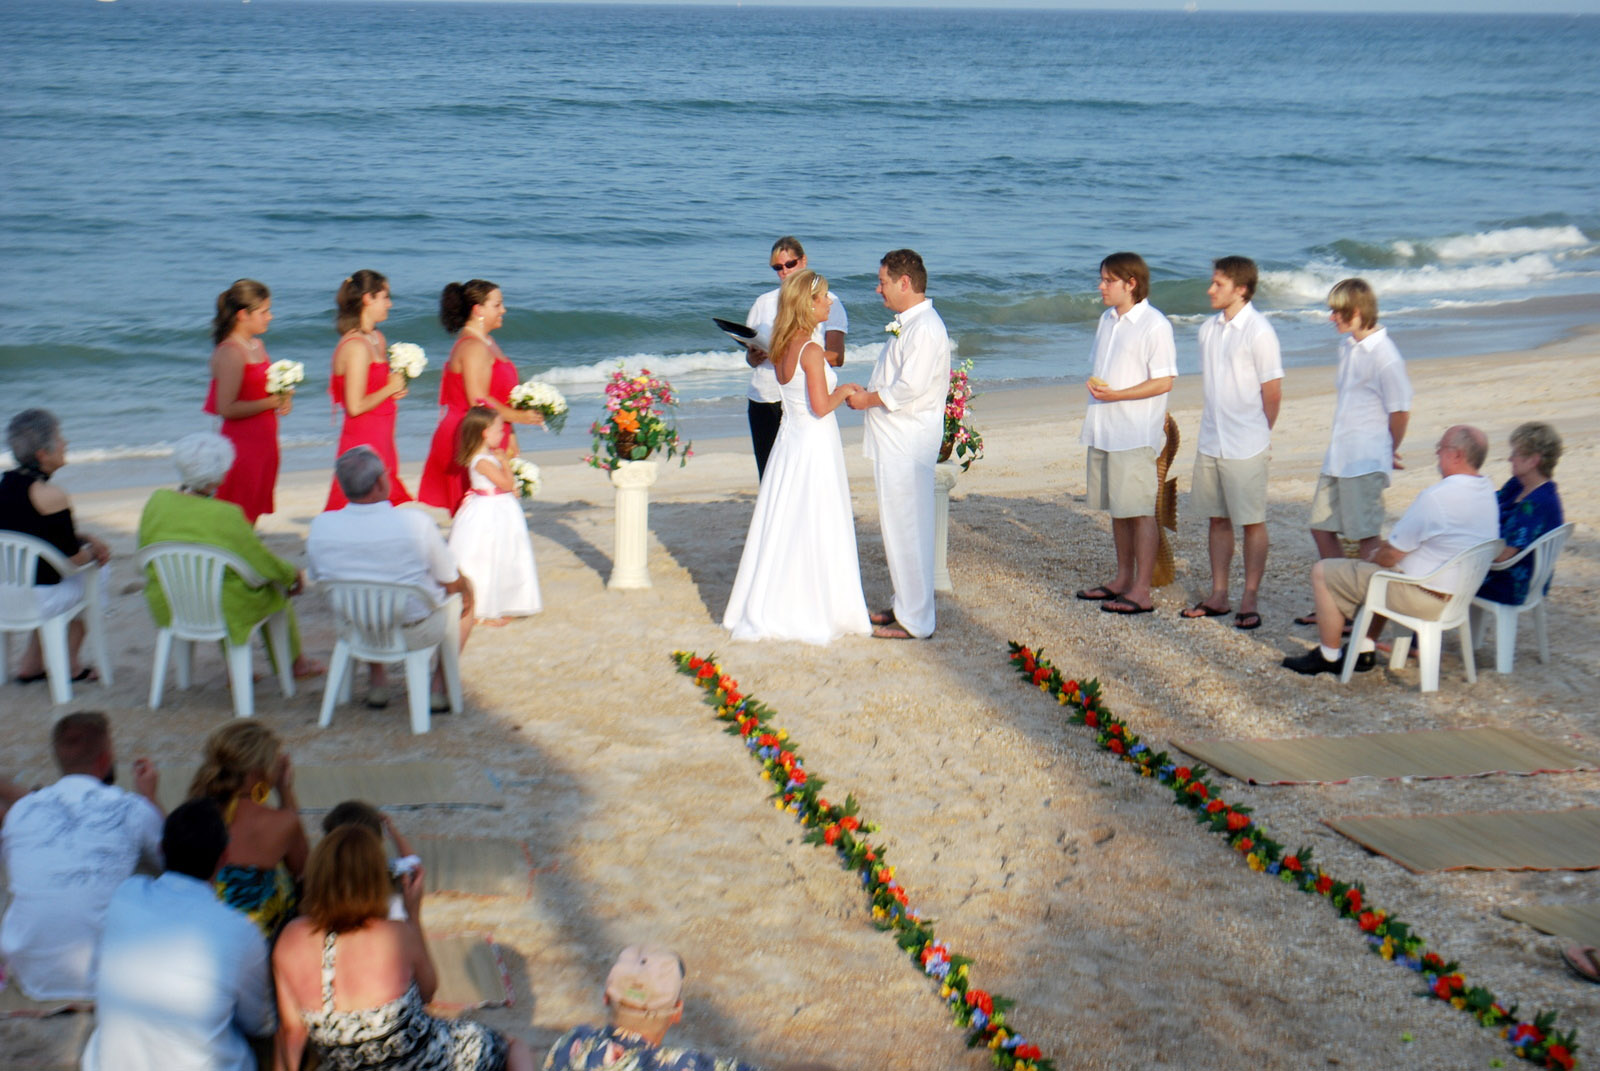 A wedding ceremony on a beach